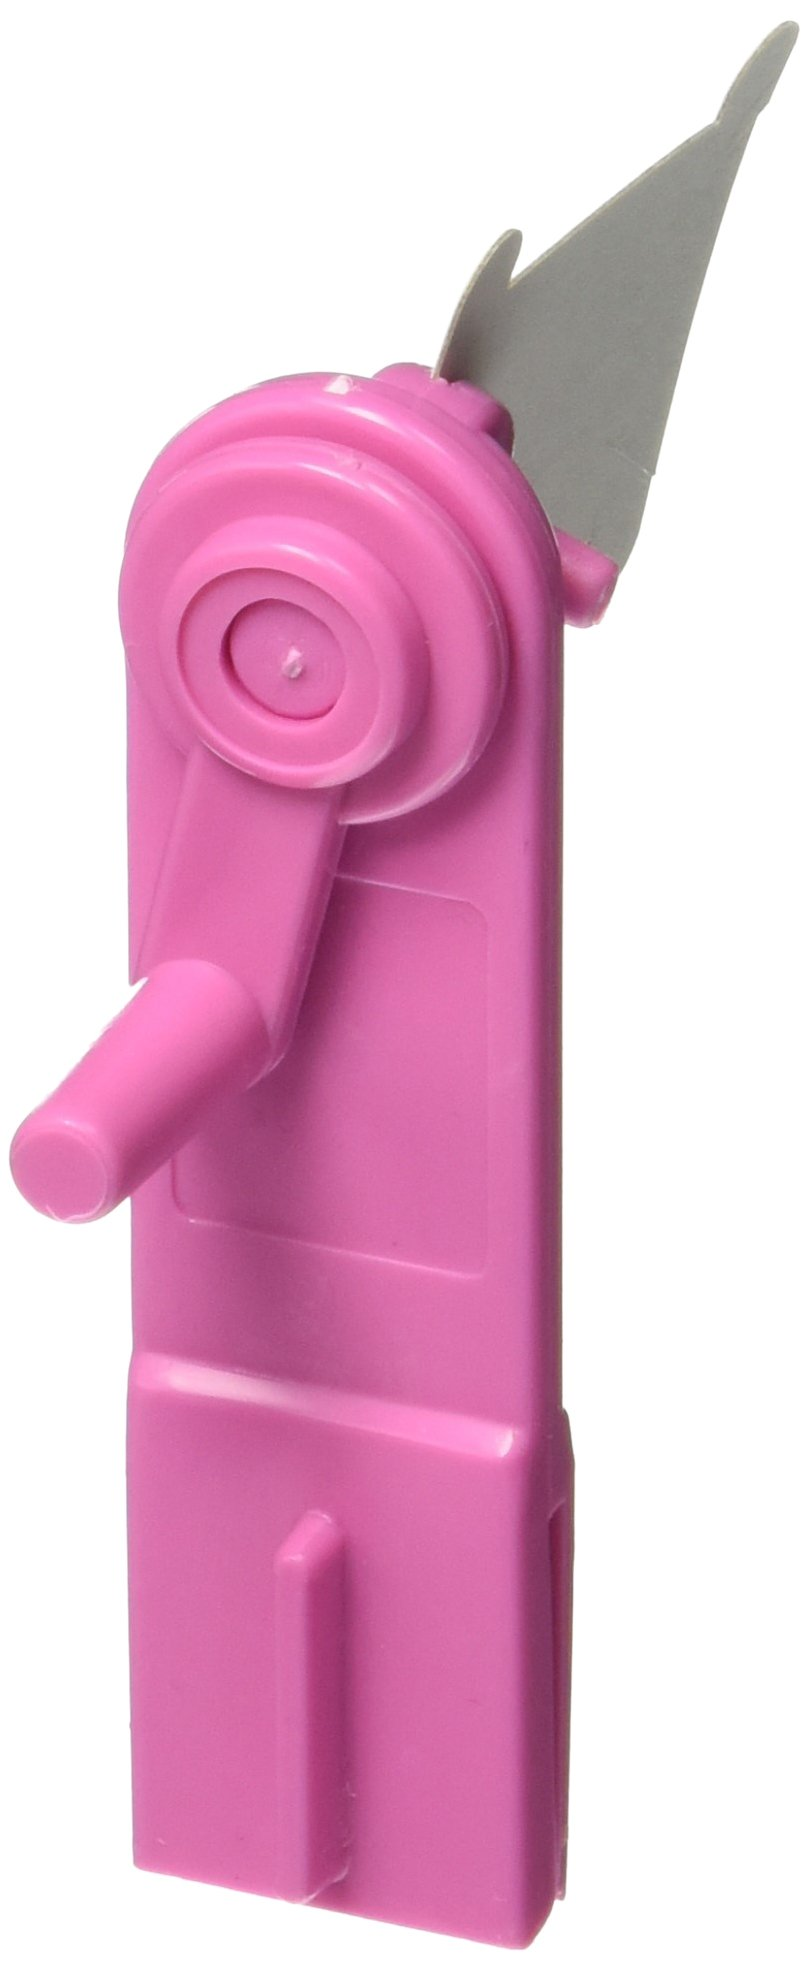 Darice Needlecraft Floss Winder with Pink Handle